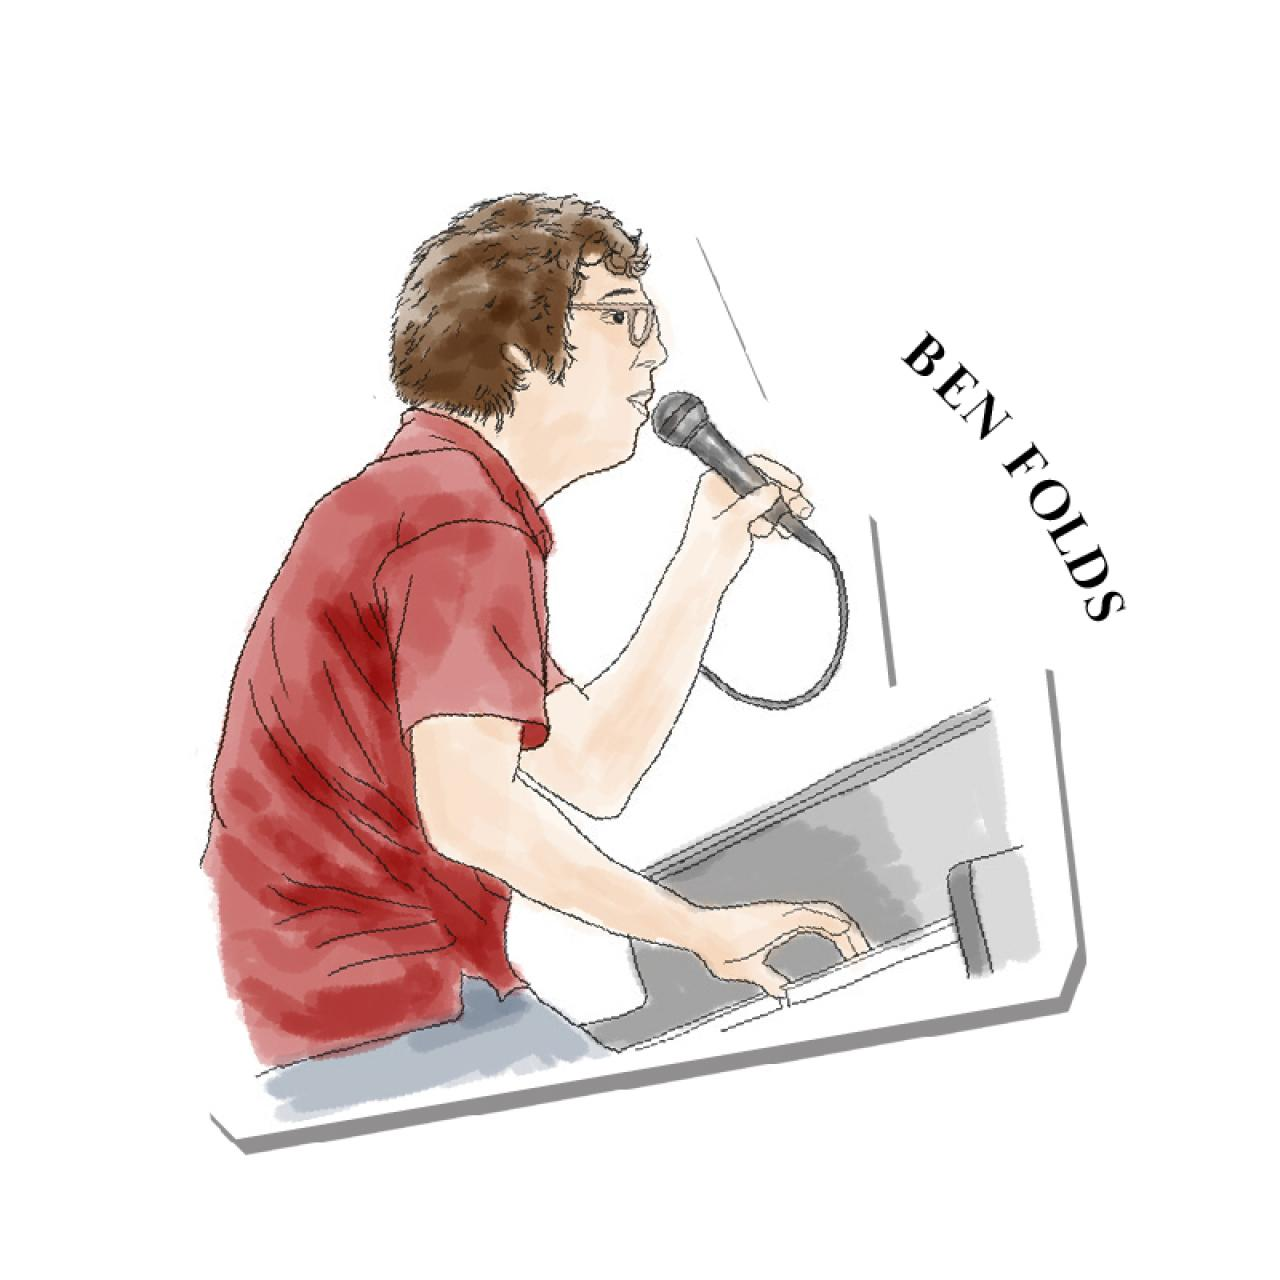 An illustration of Ben Folds